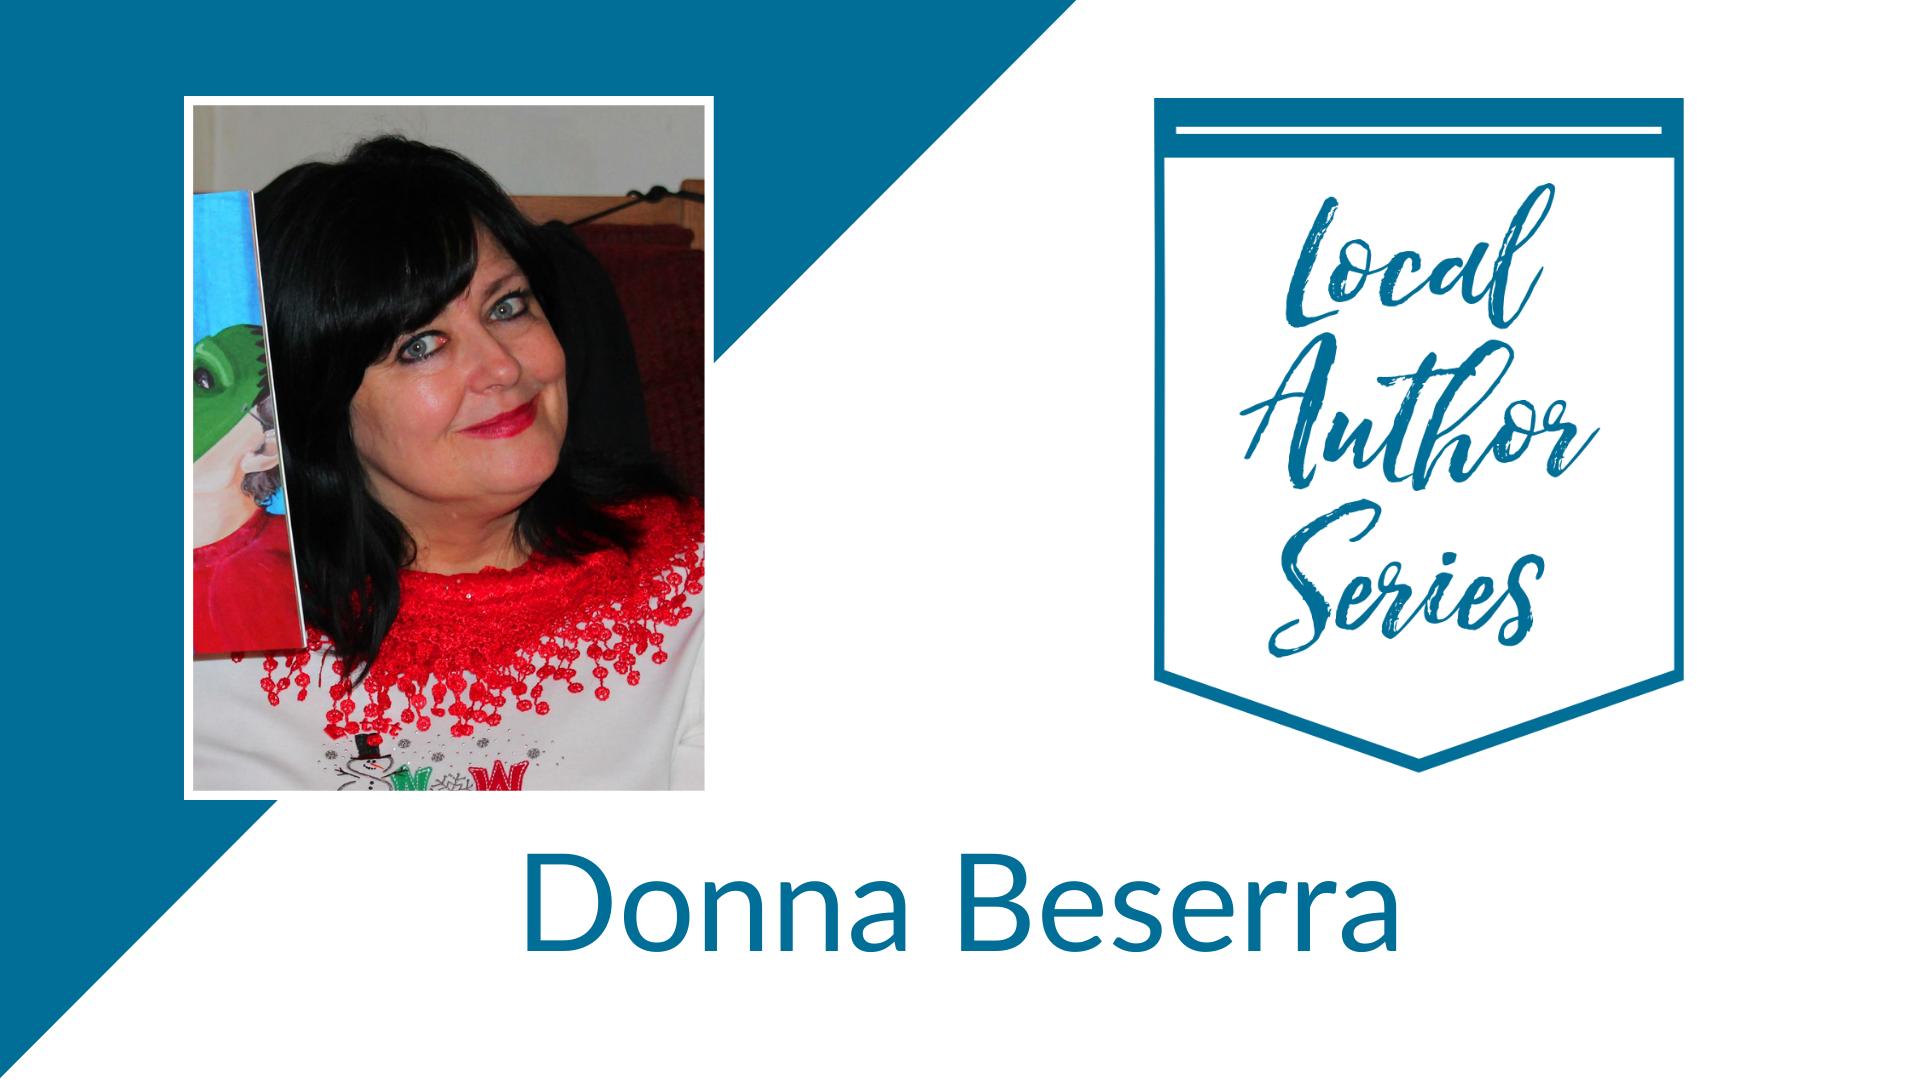 Local Author Series: Donna Beserra